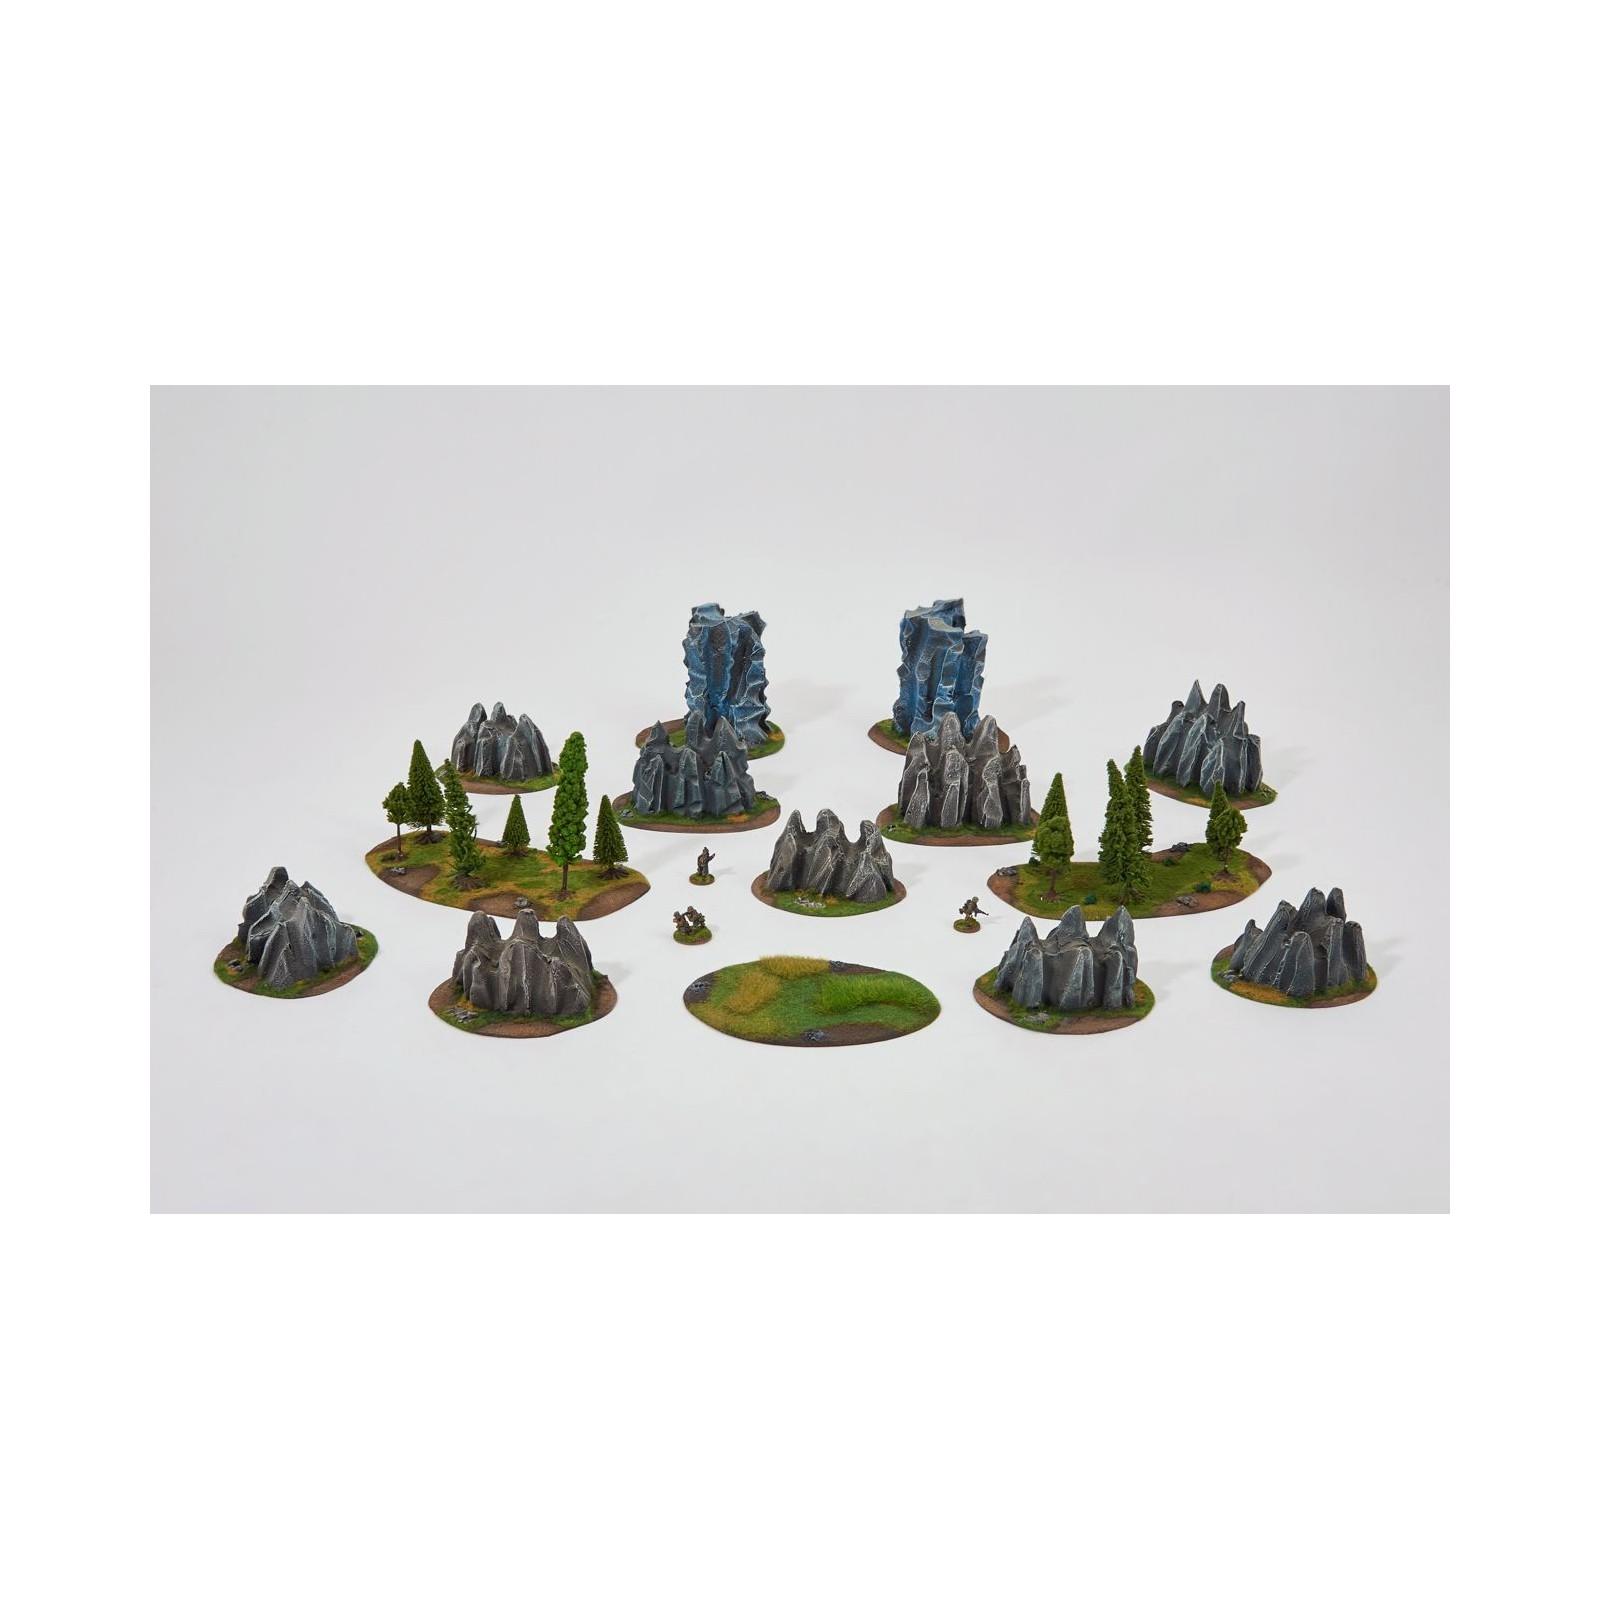 Rural Landscape D - 28mm - Set 37DMountain Landscape - Set 38